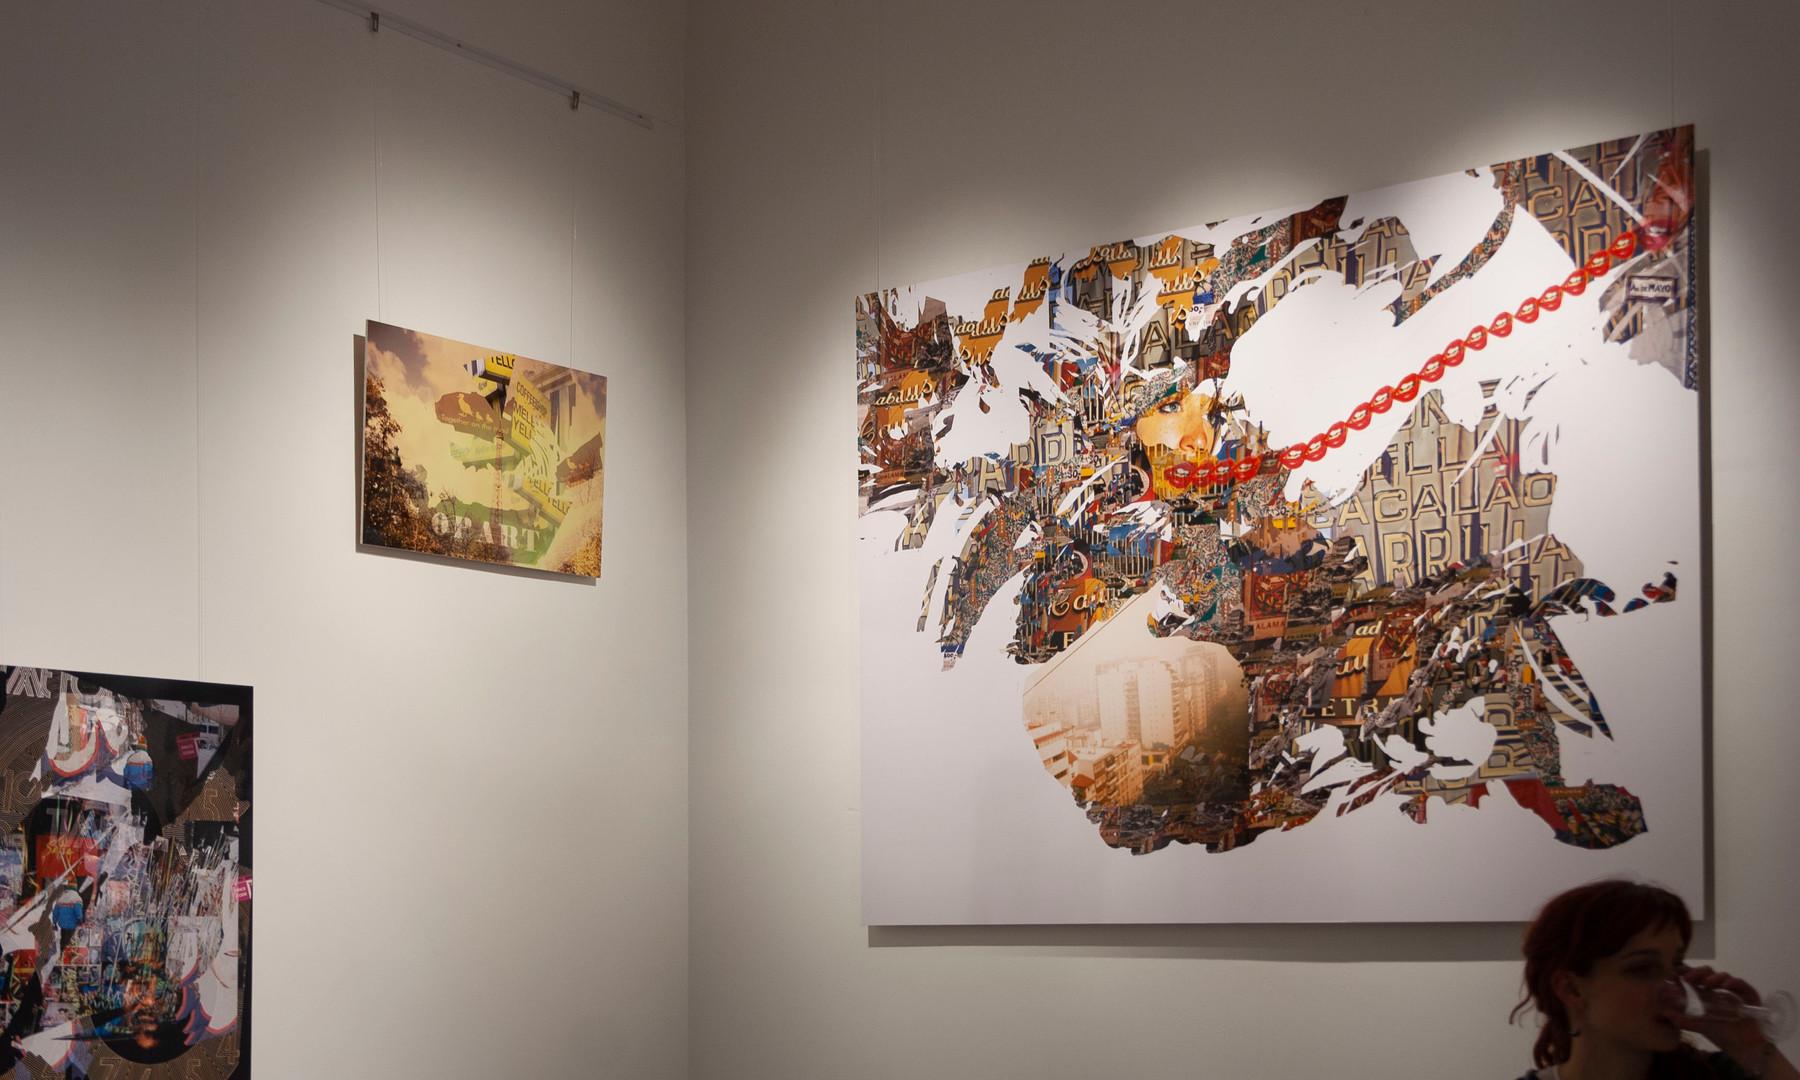 Exhibition view, Apice Arte, Buenos Aires